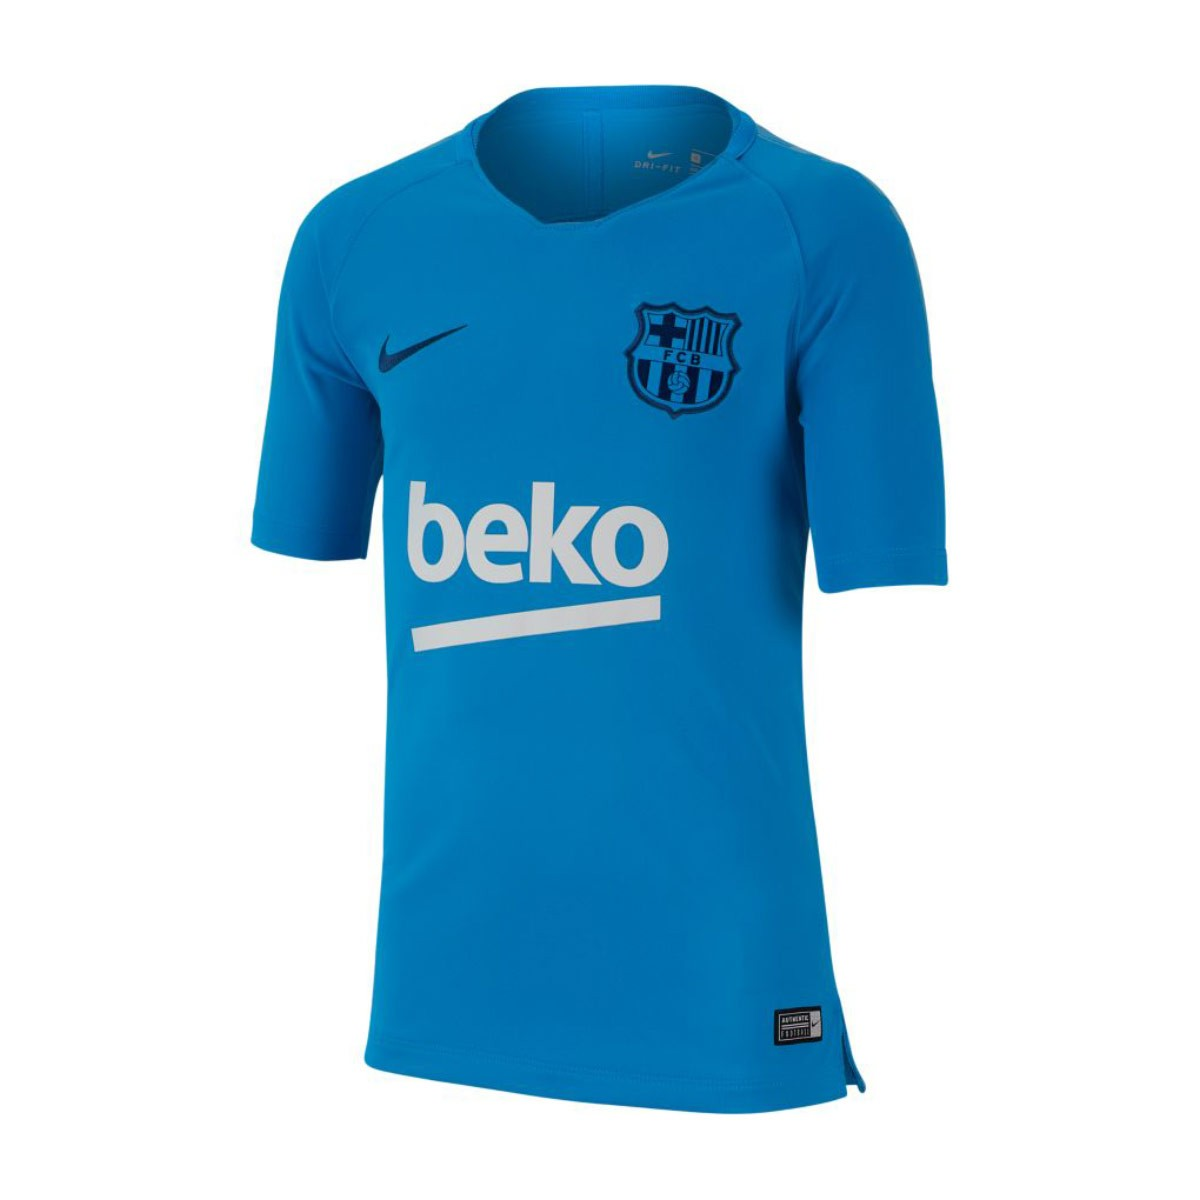 71578b7d066 Jersey Nike Kids FC Barcelona Squad 2018-2019 Equator blue-Coastal ...